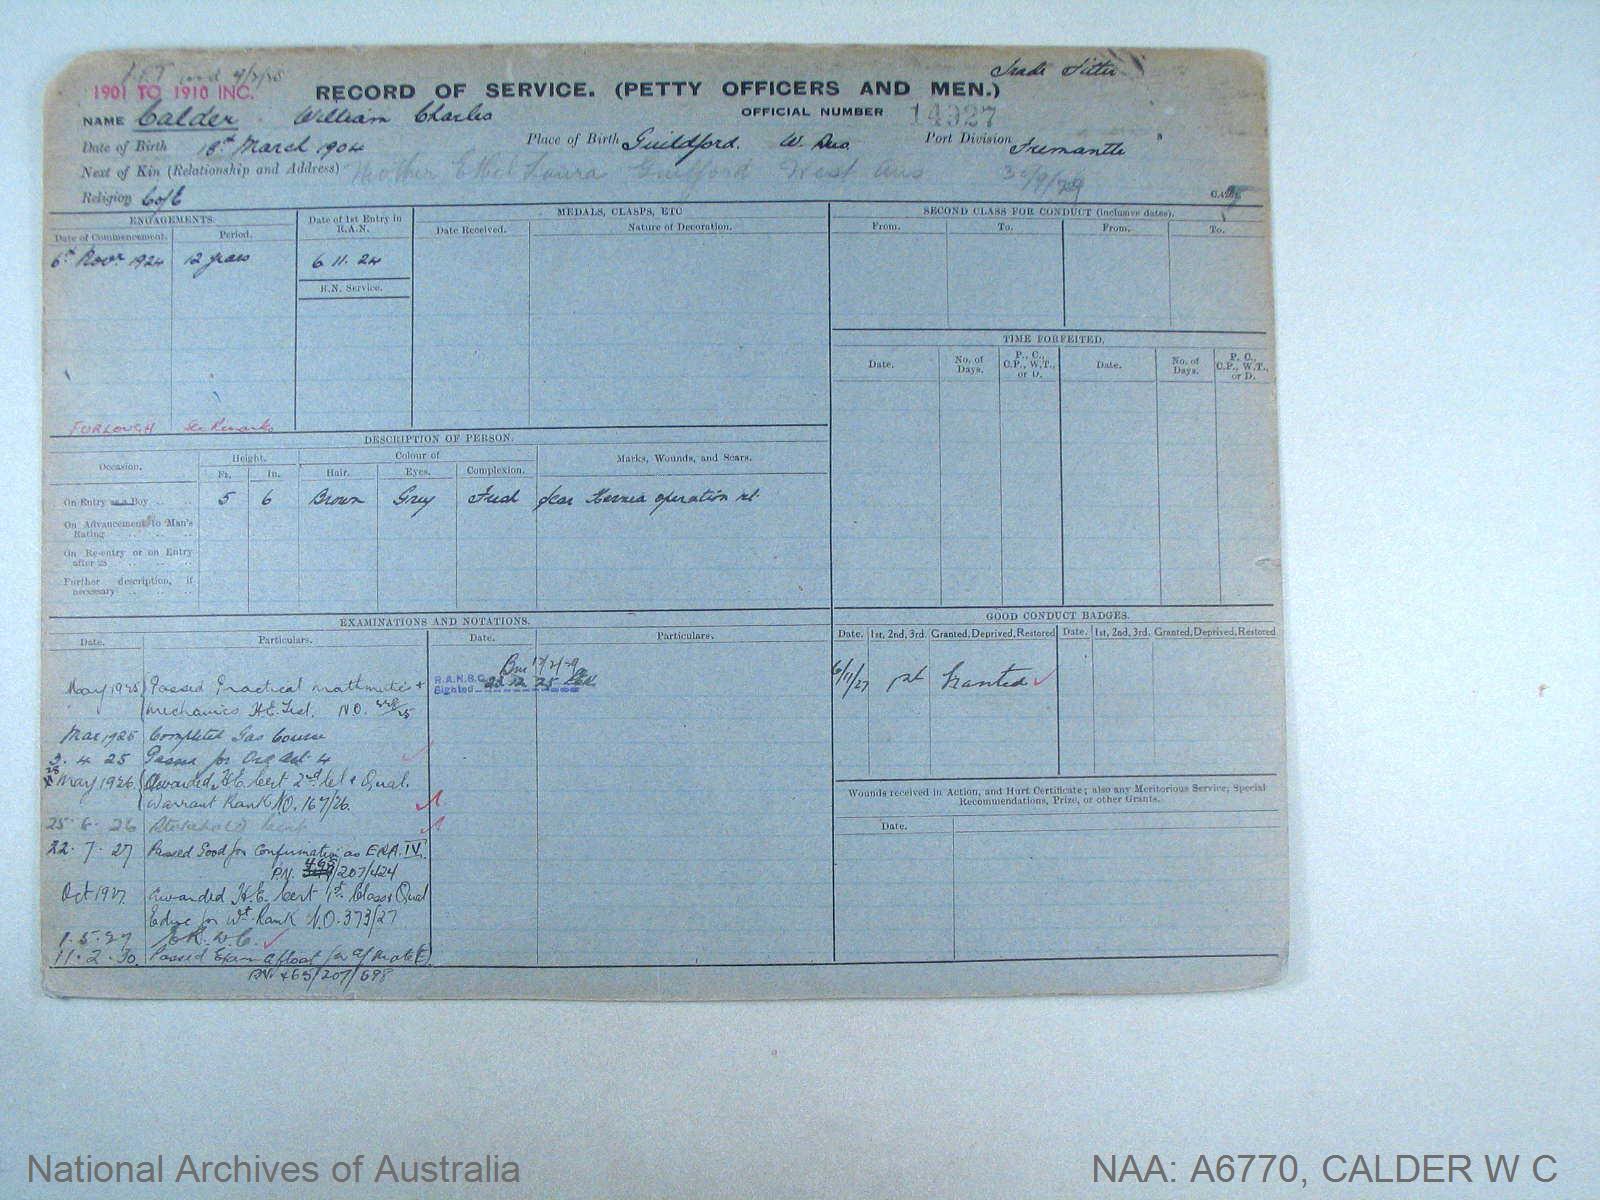 CALDER WILLIAM CHARLES : Service Number - 14927 : Date of birth - 18 Mar 1904 : Place of birth - GUILDFORD WA : Place of enlistment - FREMANTLE : Next of Kin - CALDER ETHEL